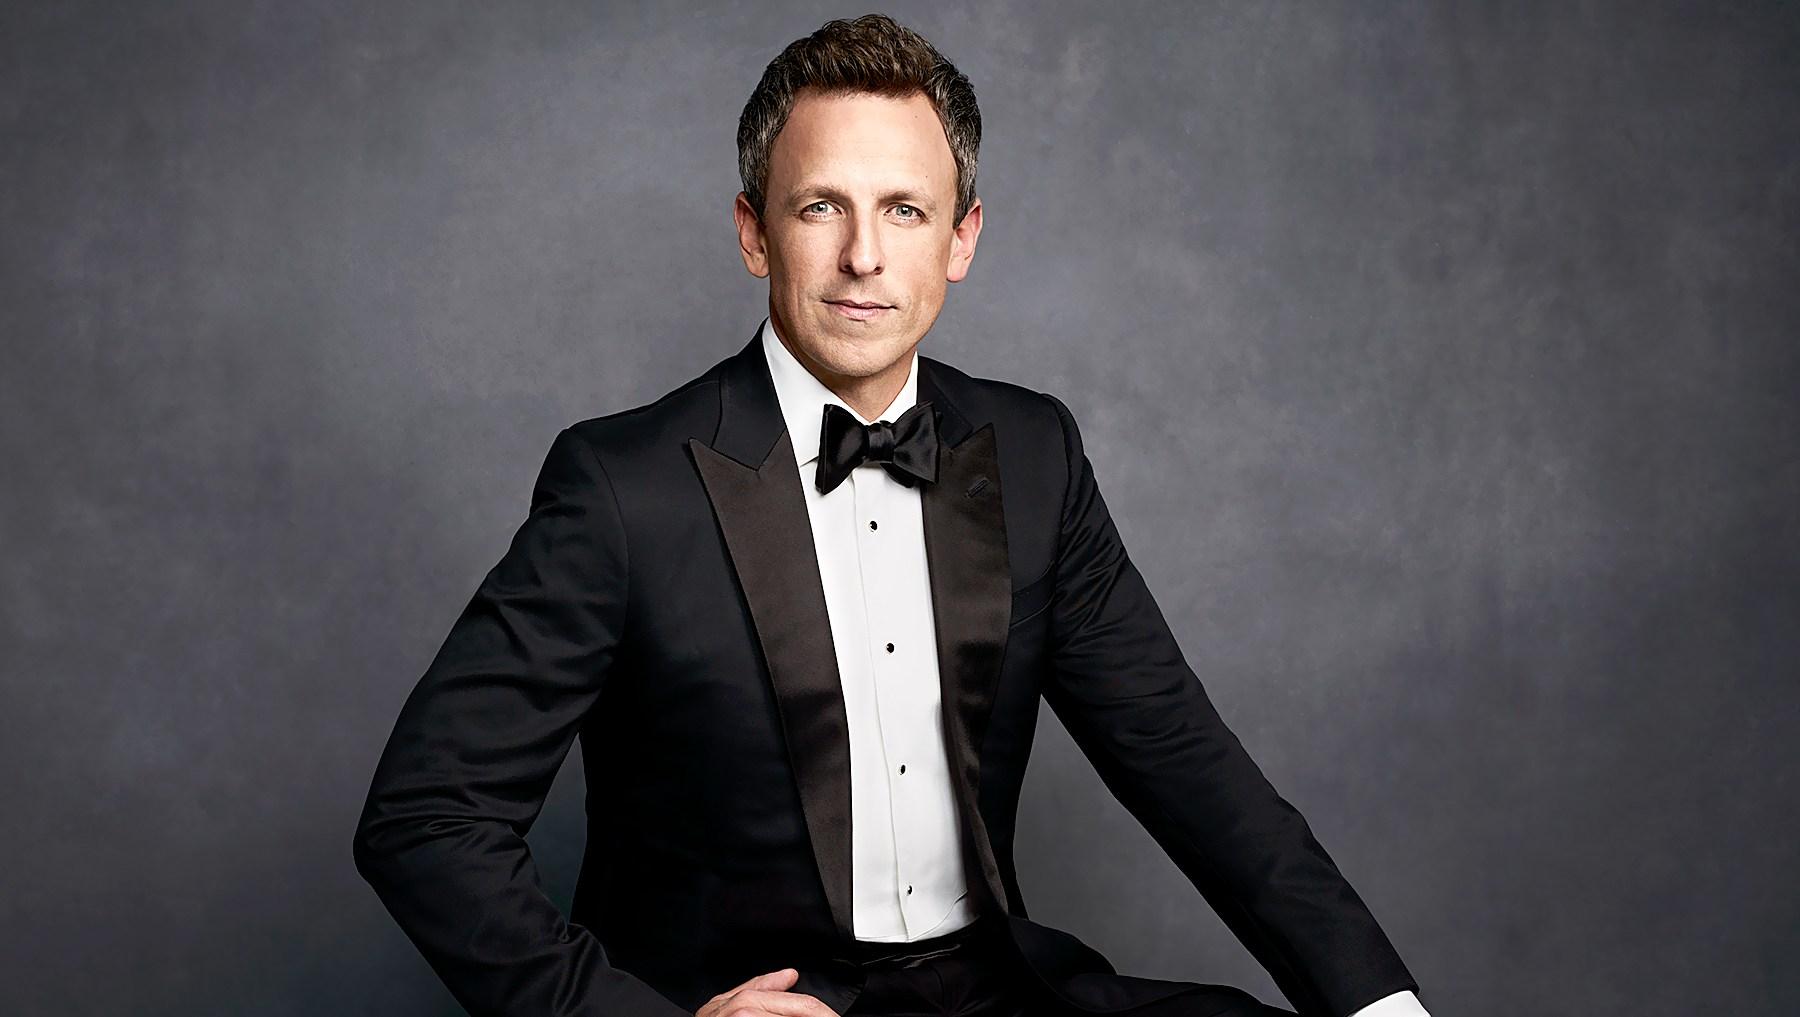 Seth-Meyers-Golden-Globes